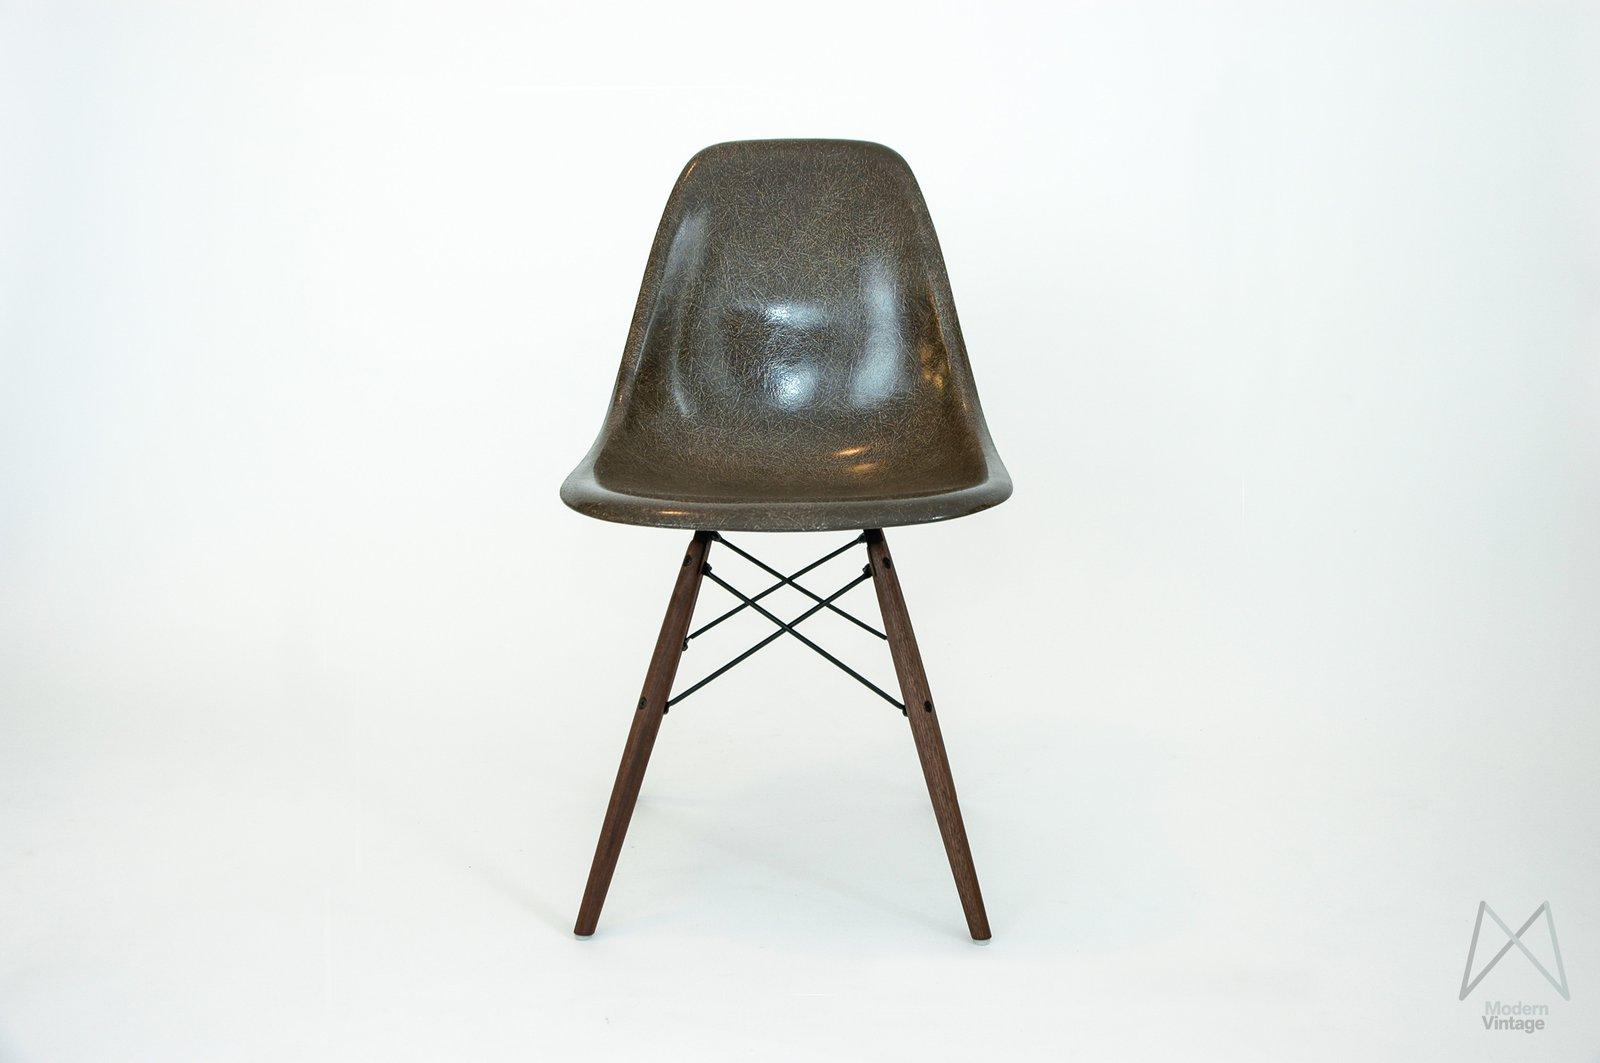 Sessel Eames modern vintage amsterdam original eames furniture eames dsw dsx